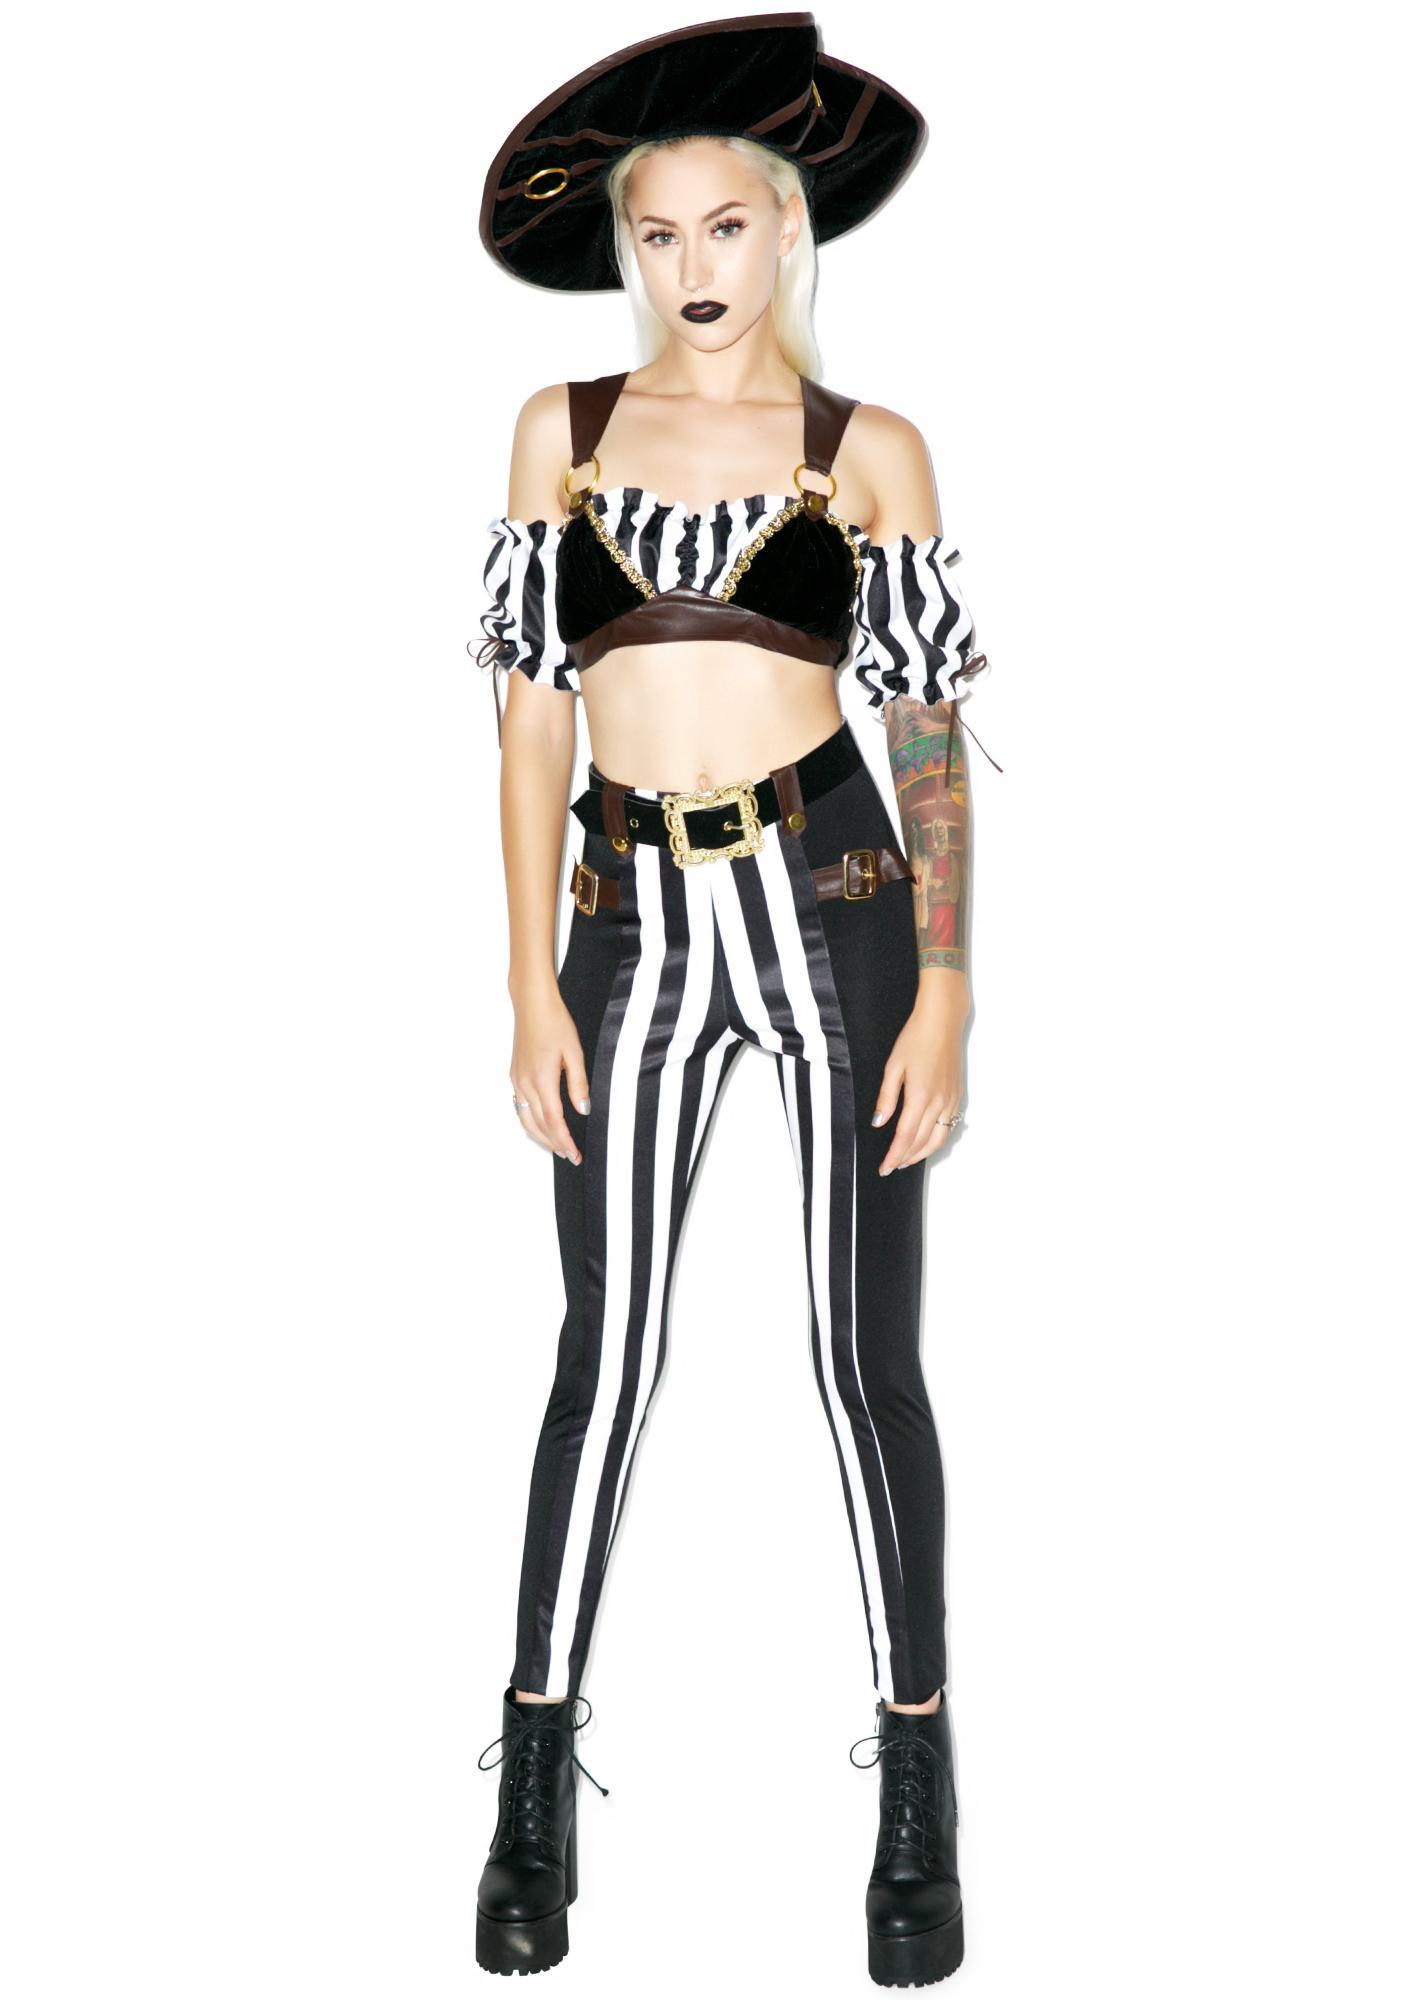 Pirate's Booty Costume